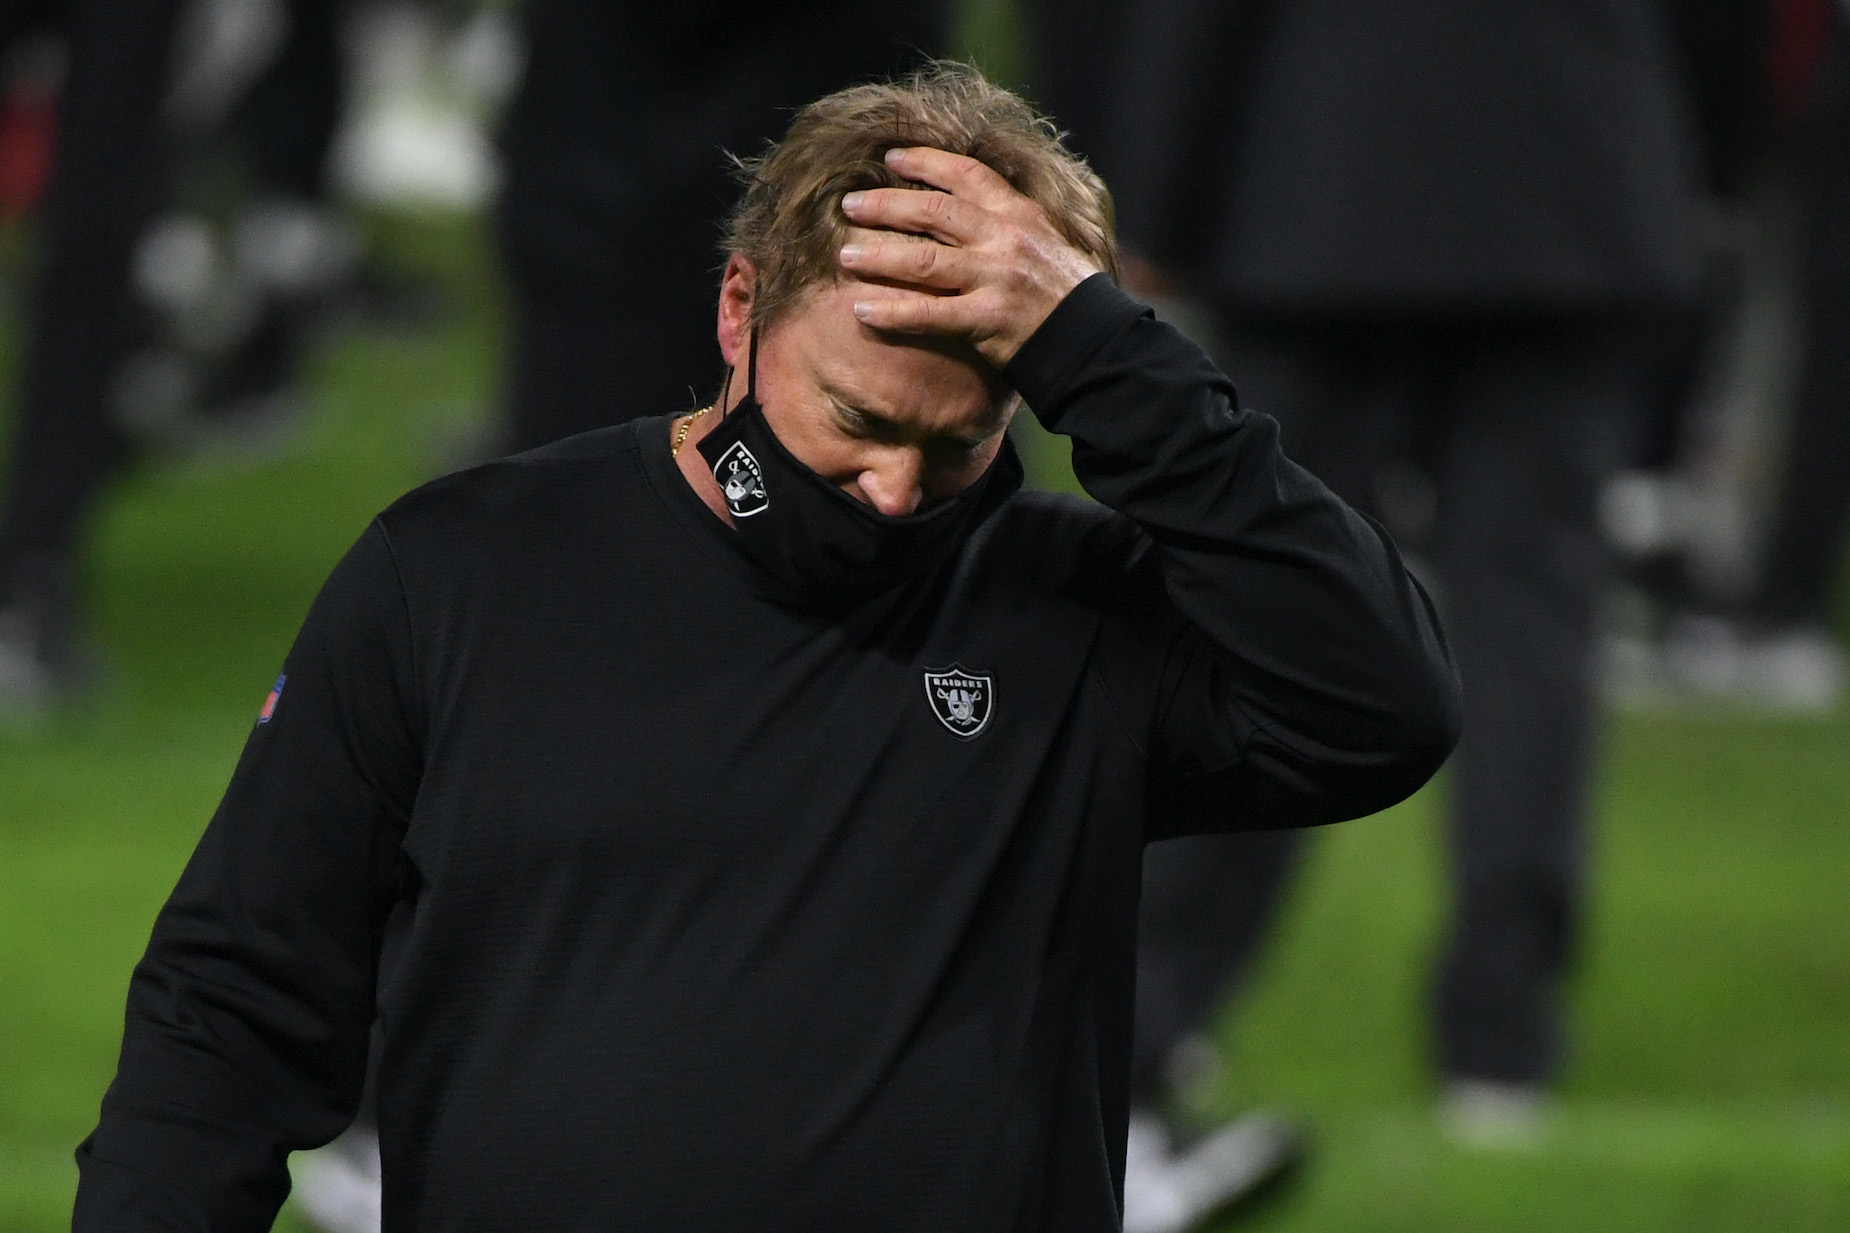 Raiders head coach Jon Gruden reacts to a loss.